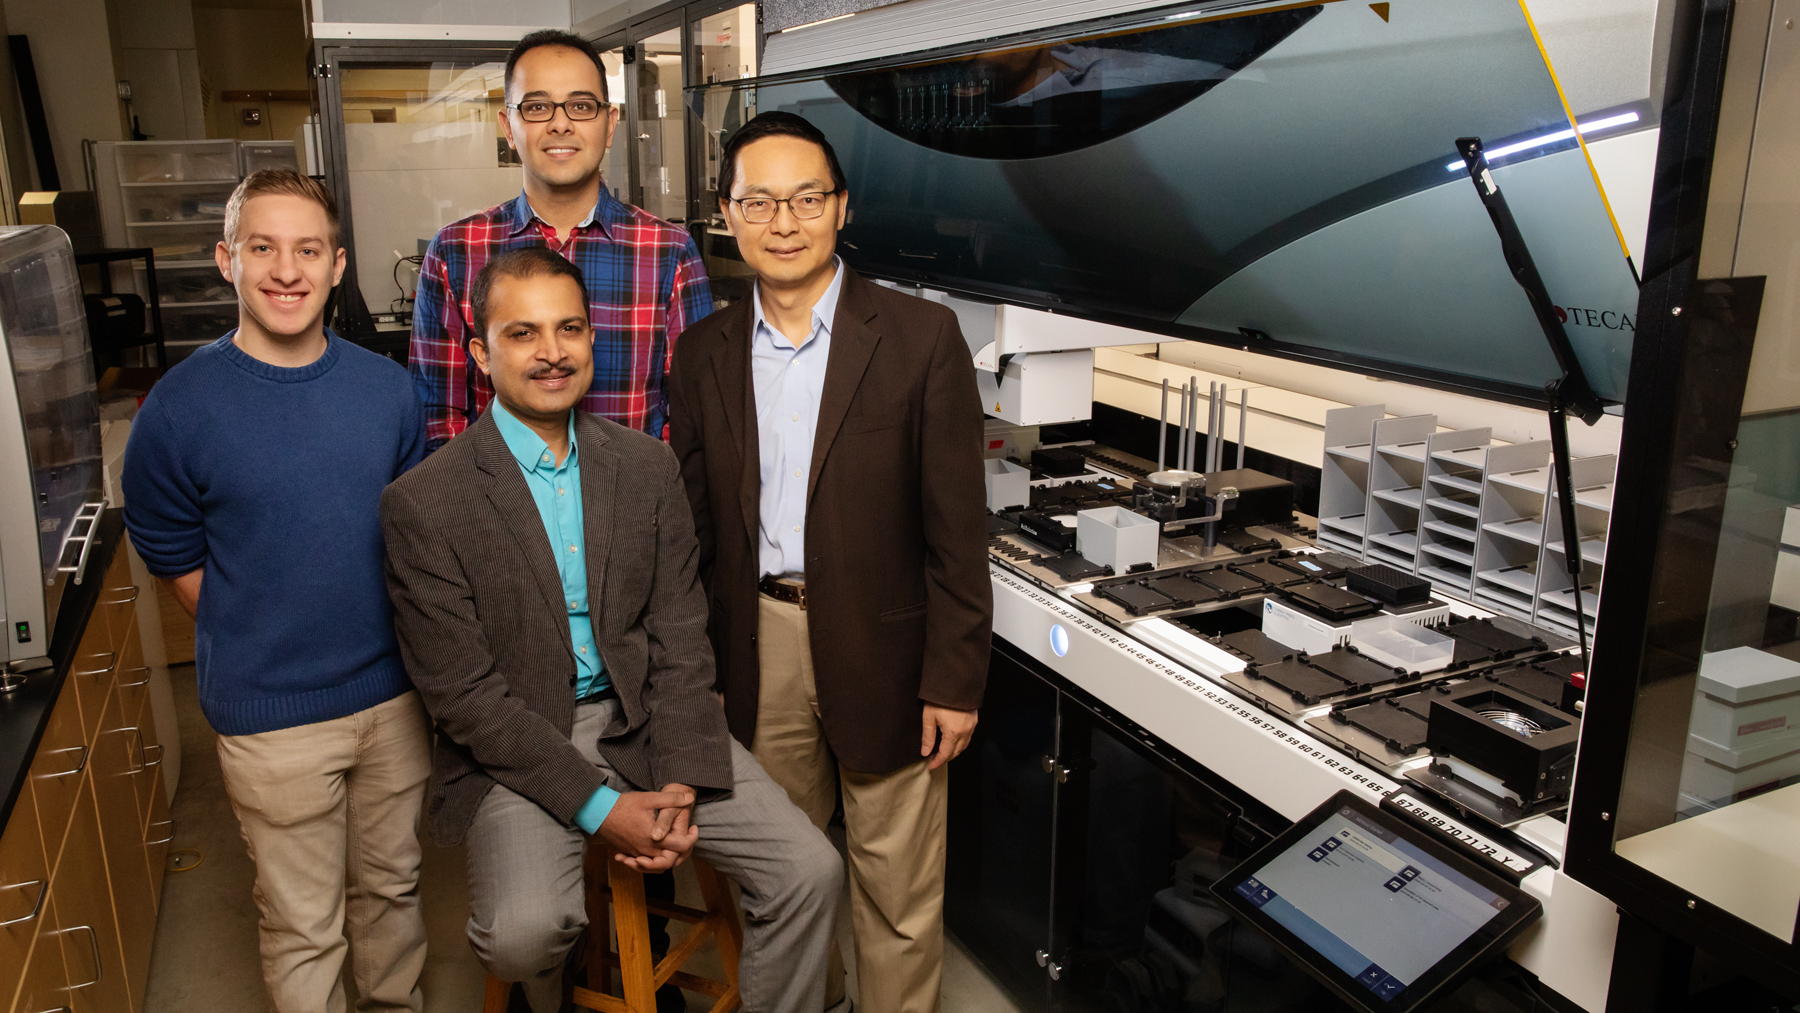 Scott Weisberg, professor Saurabh Sinha, Mohammad (Sam) Hamedi Rad and professor Huimin Zhao. Photo by Brian Stauffer